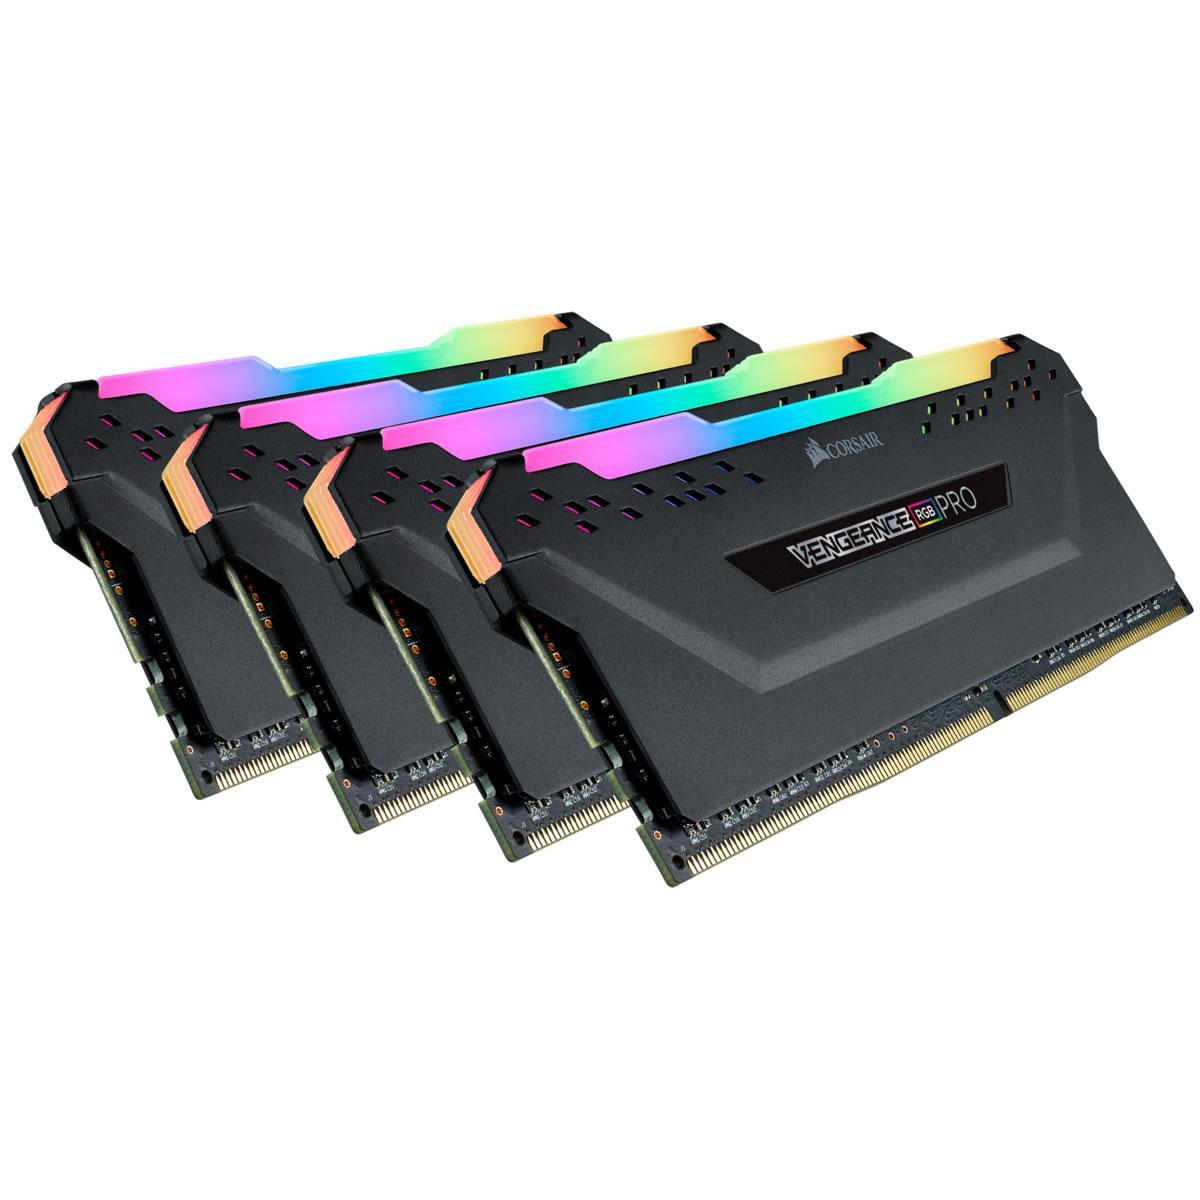 Corsair Vengeance RGB Pro 128 GB (4 x 32 GB) DDR4-3600 CL18 Memory